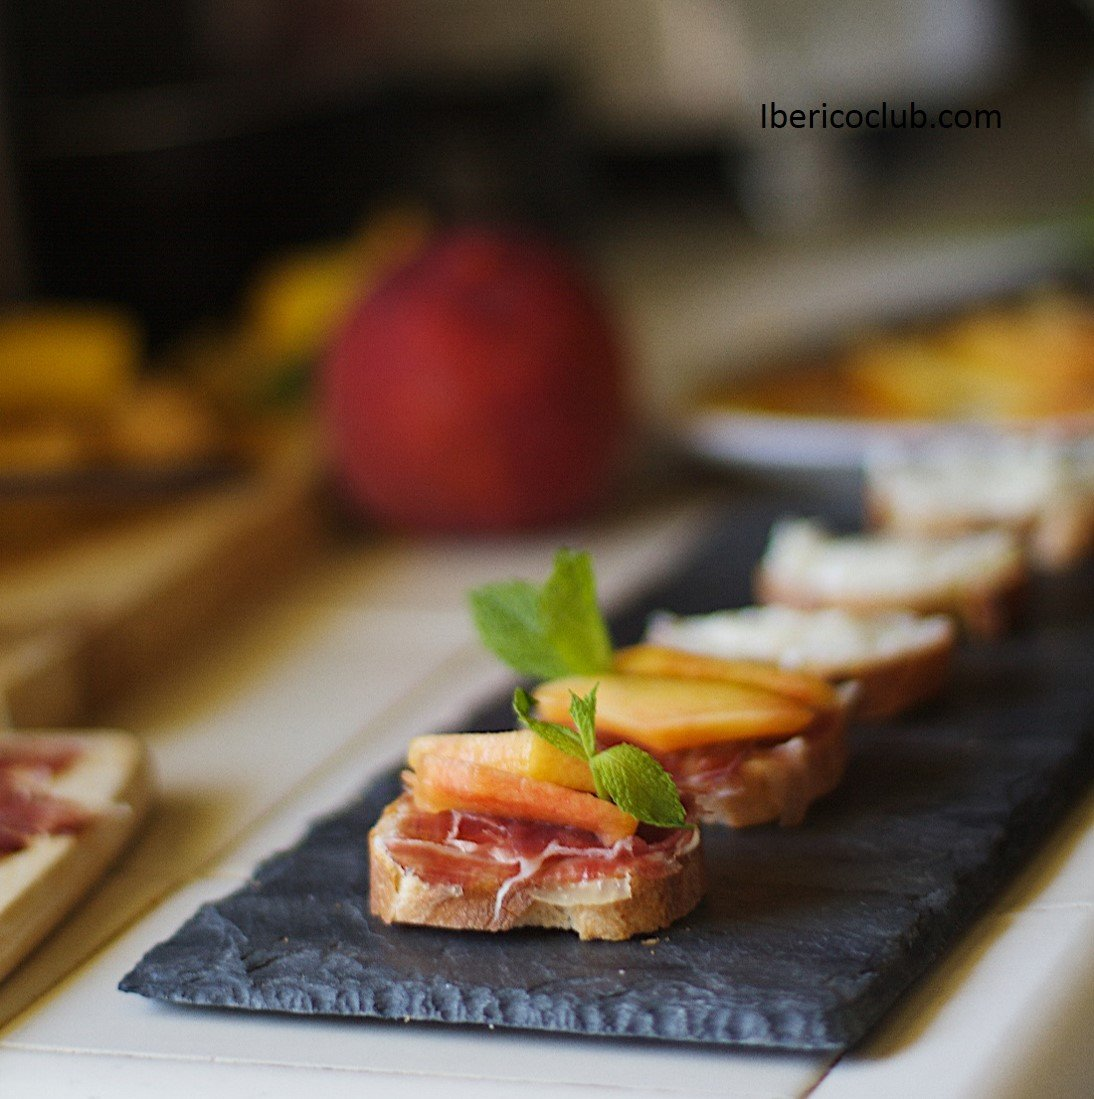 Jamon iberico de bellota with peach